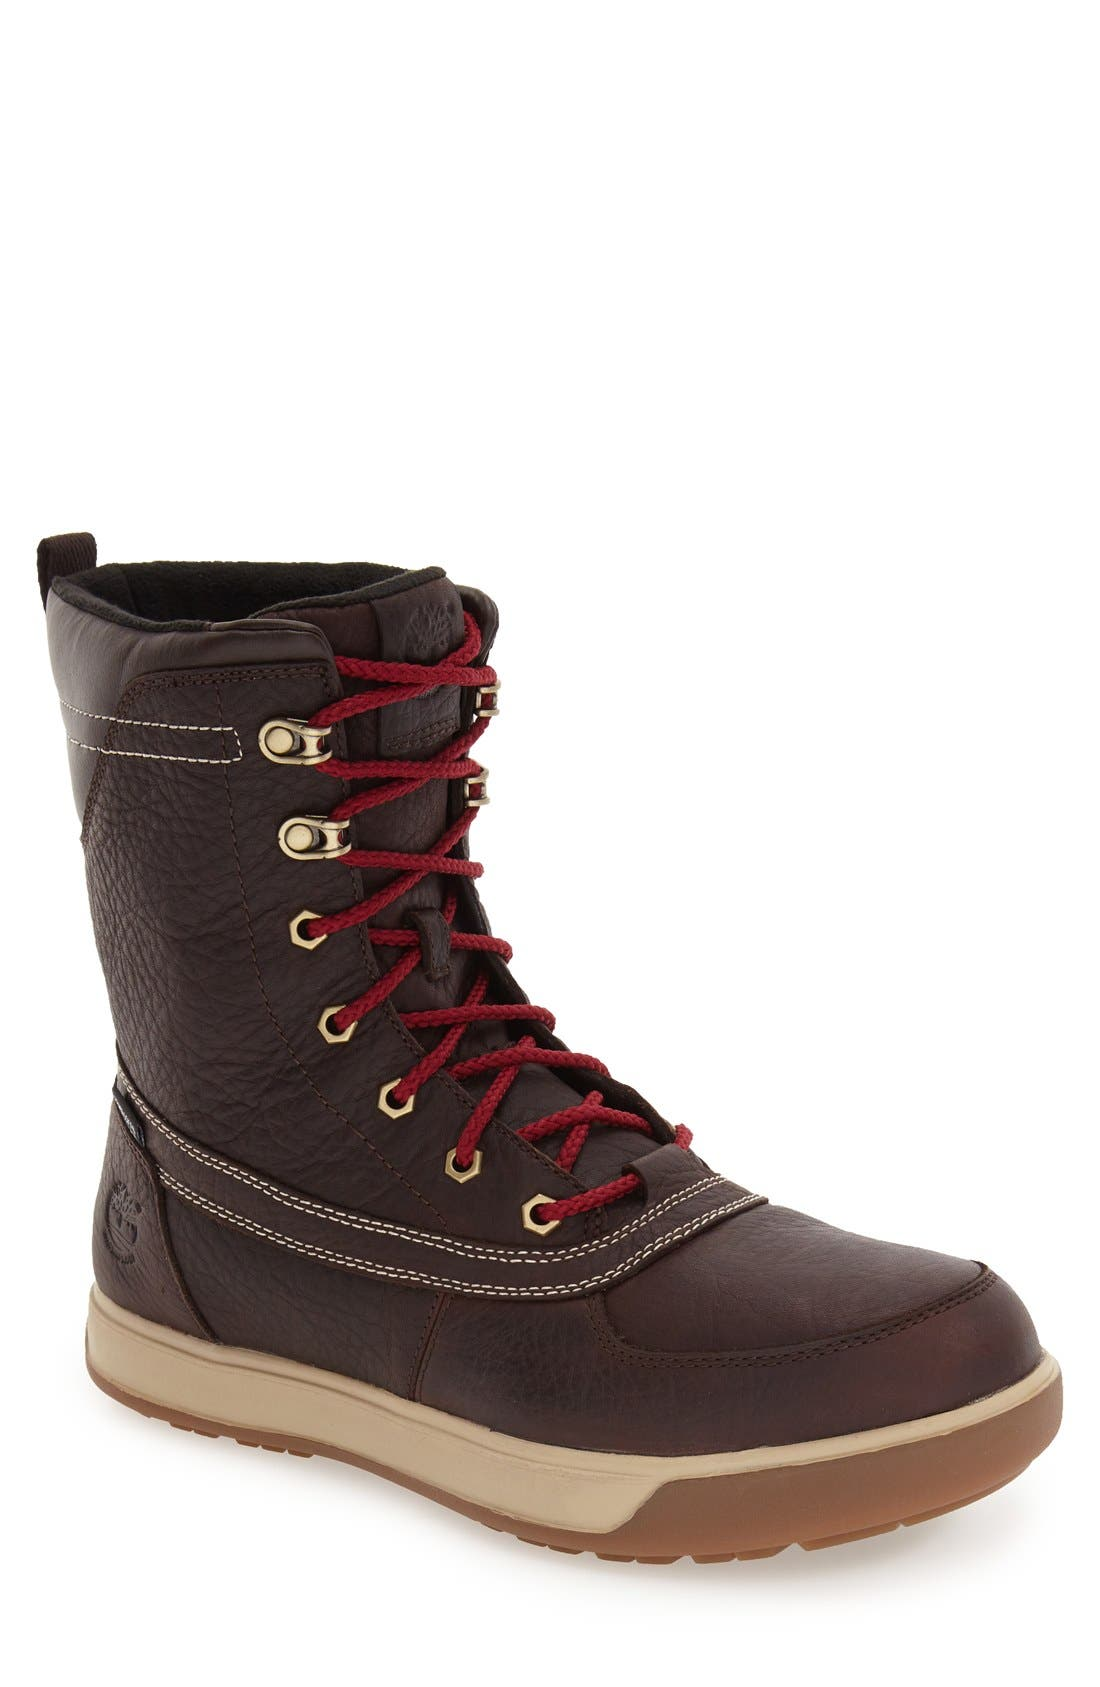 'Tenmile' Snow Boot, Main, color, 201